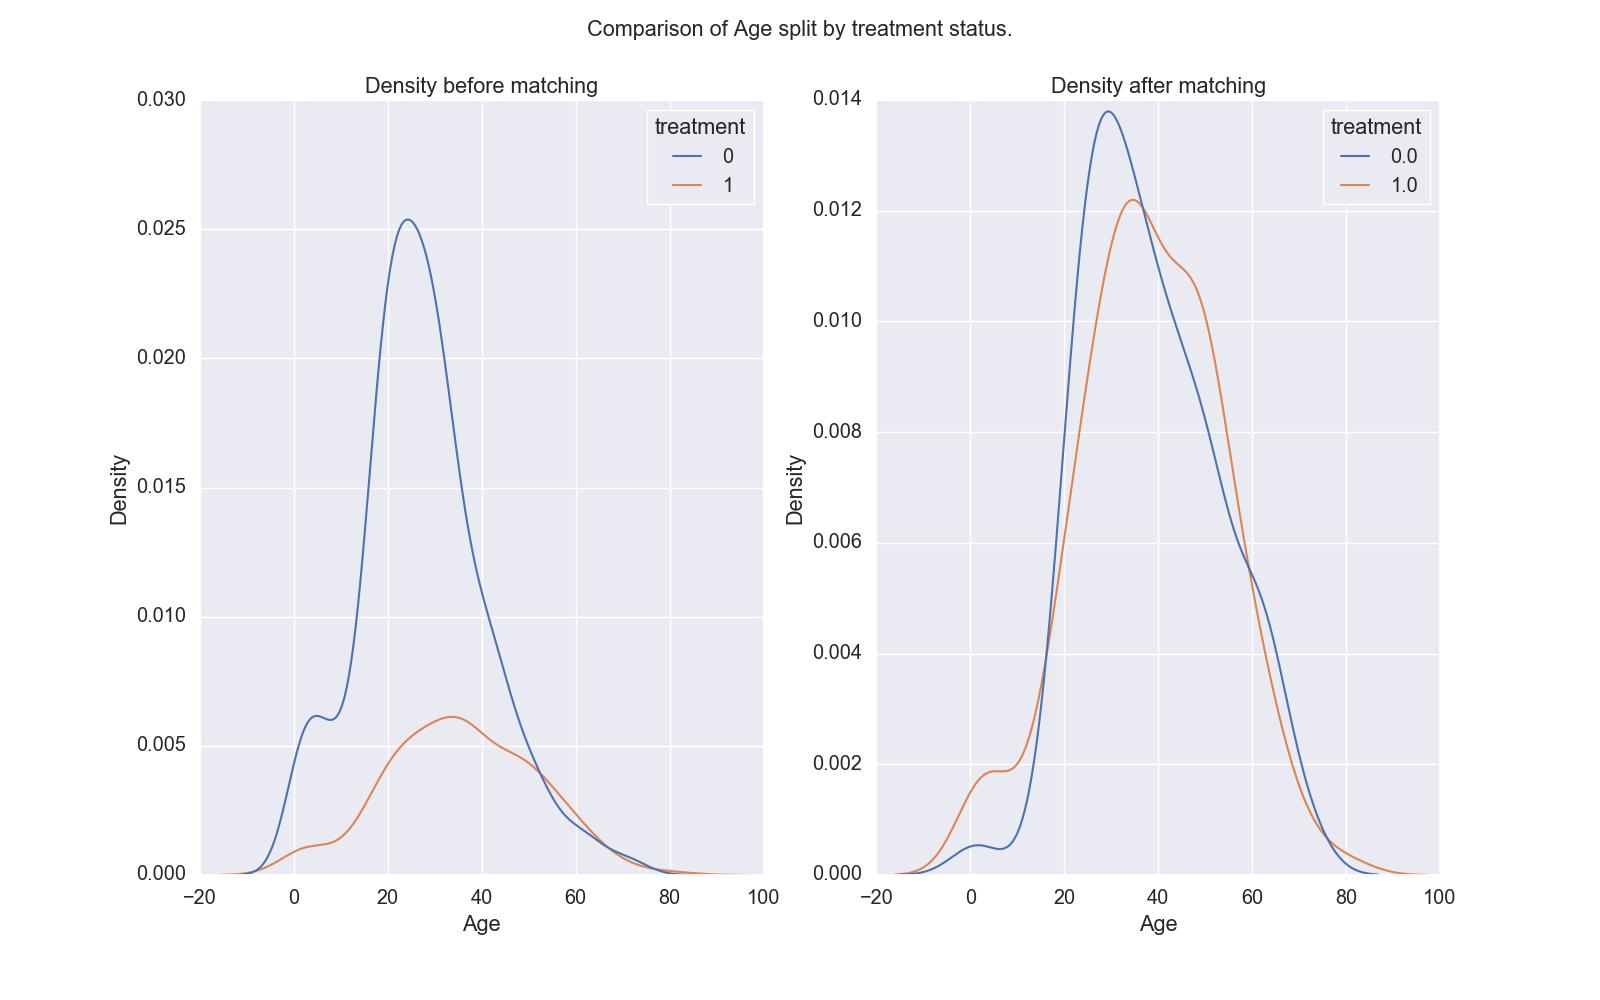 age density comparison